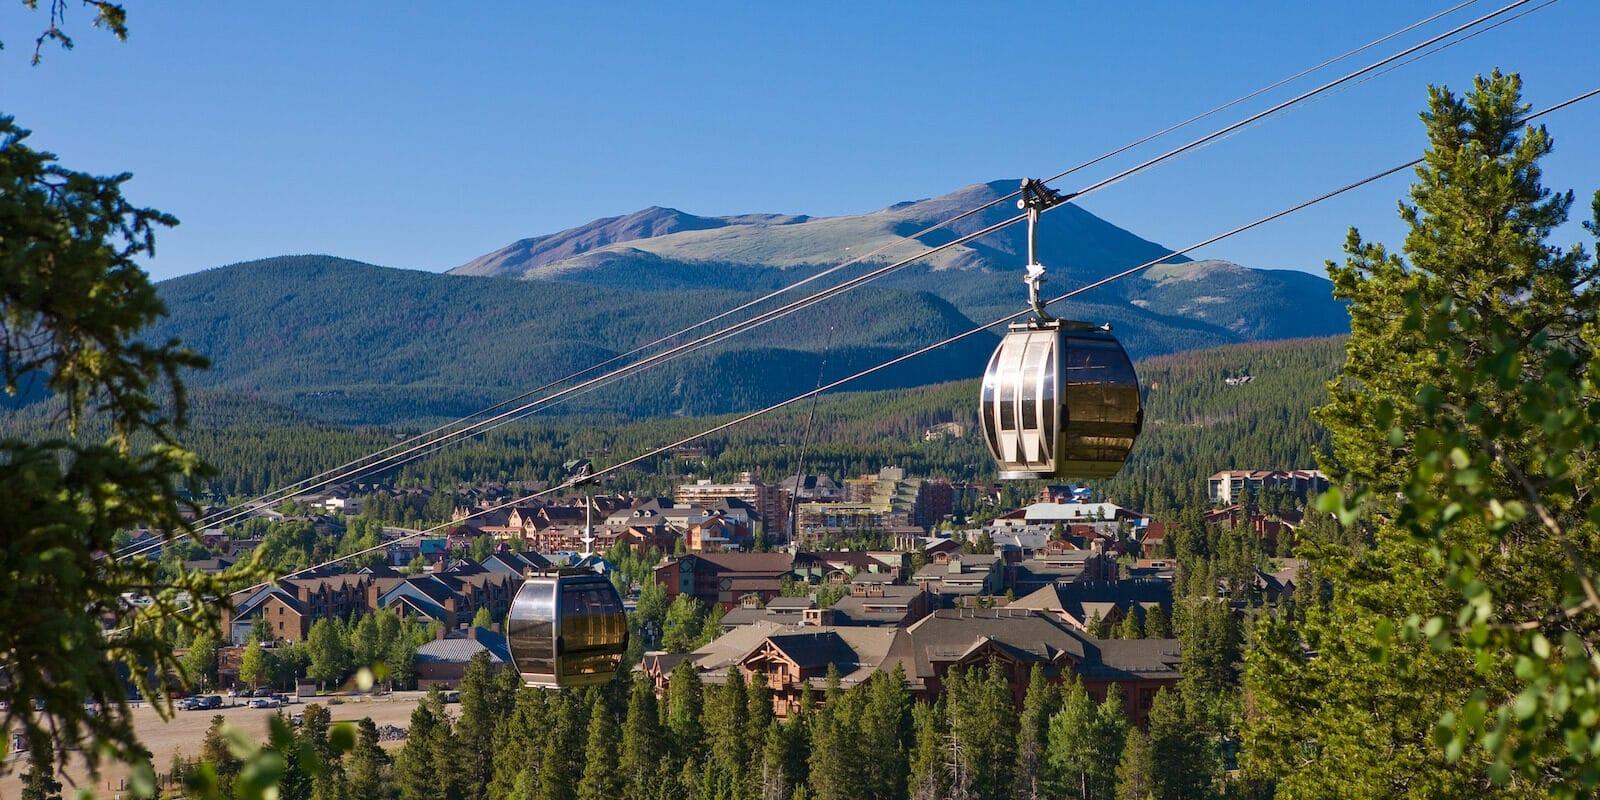 Image of the BreckConnect Gondola and Breckenridge, Colorado landscape